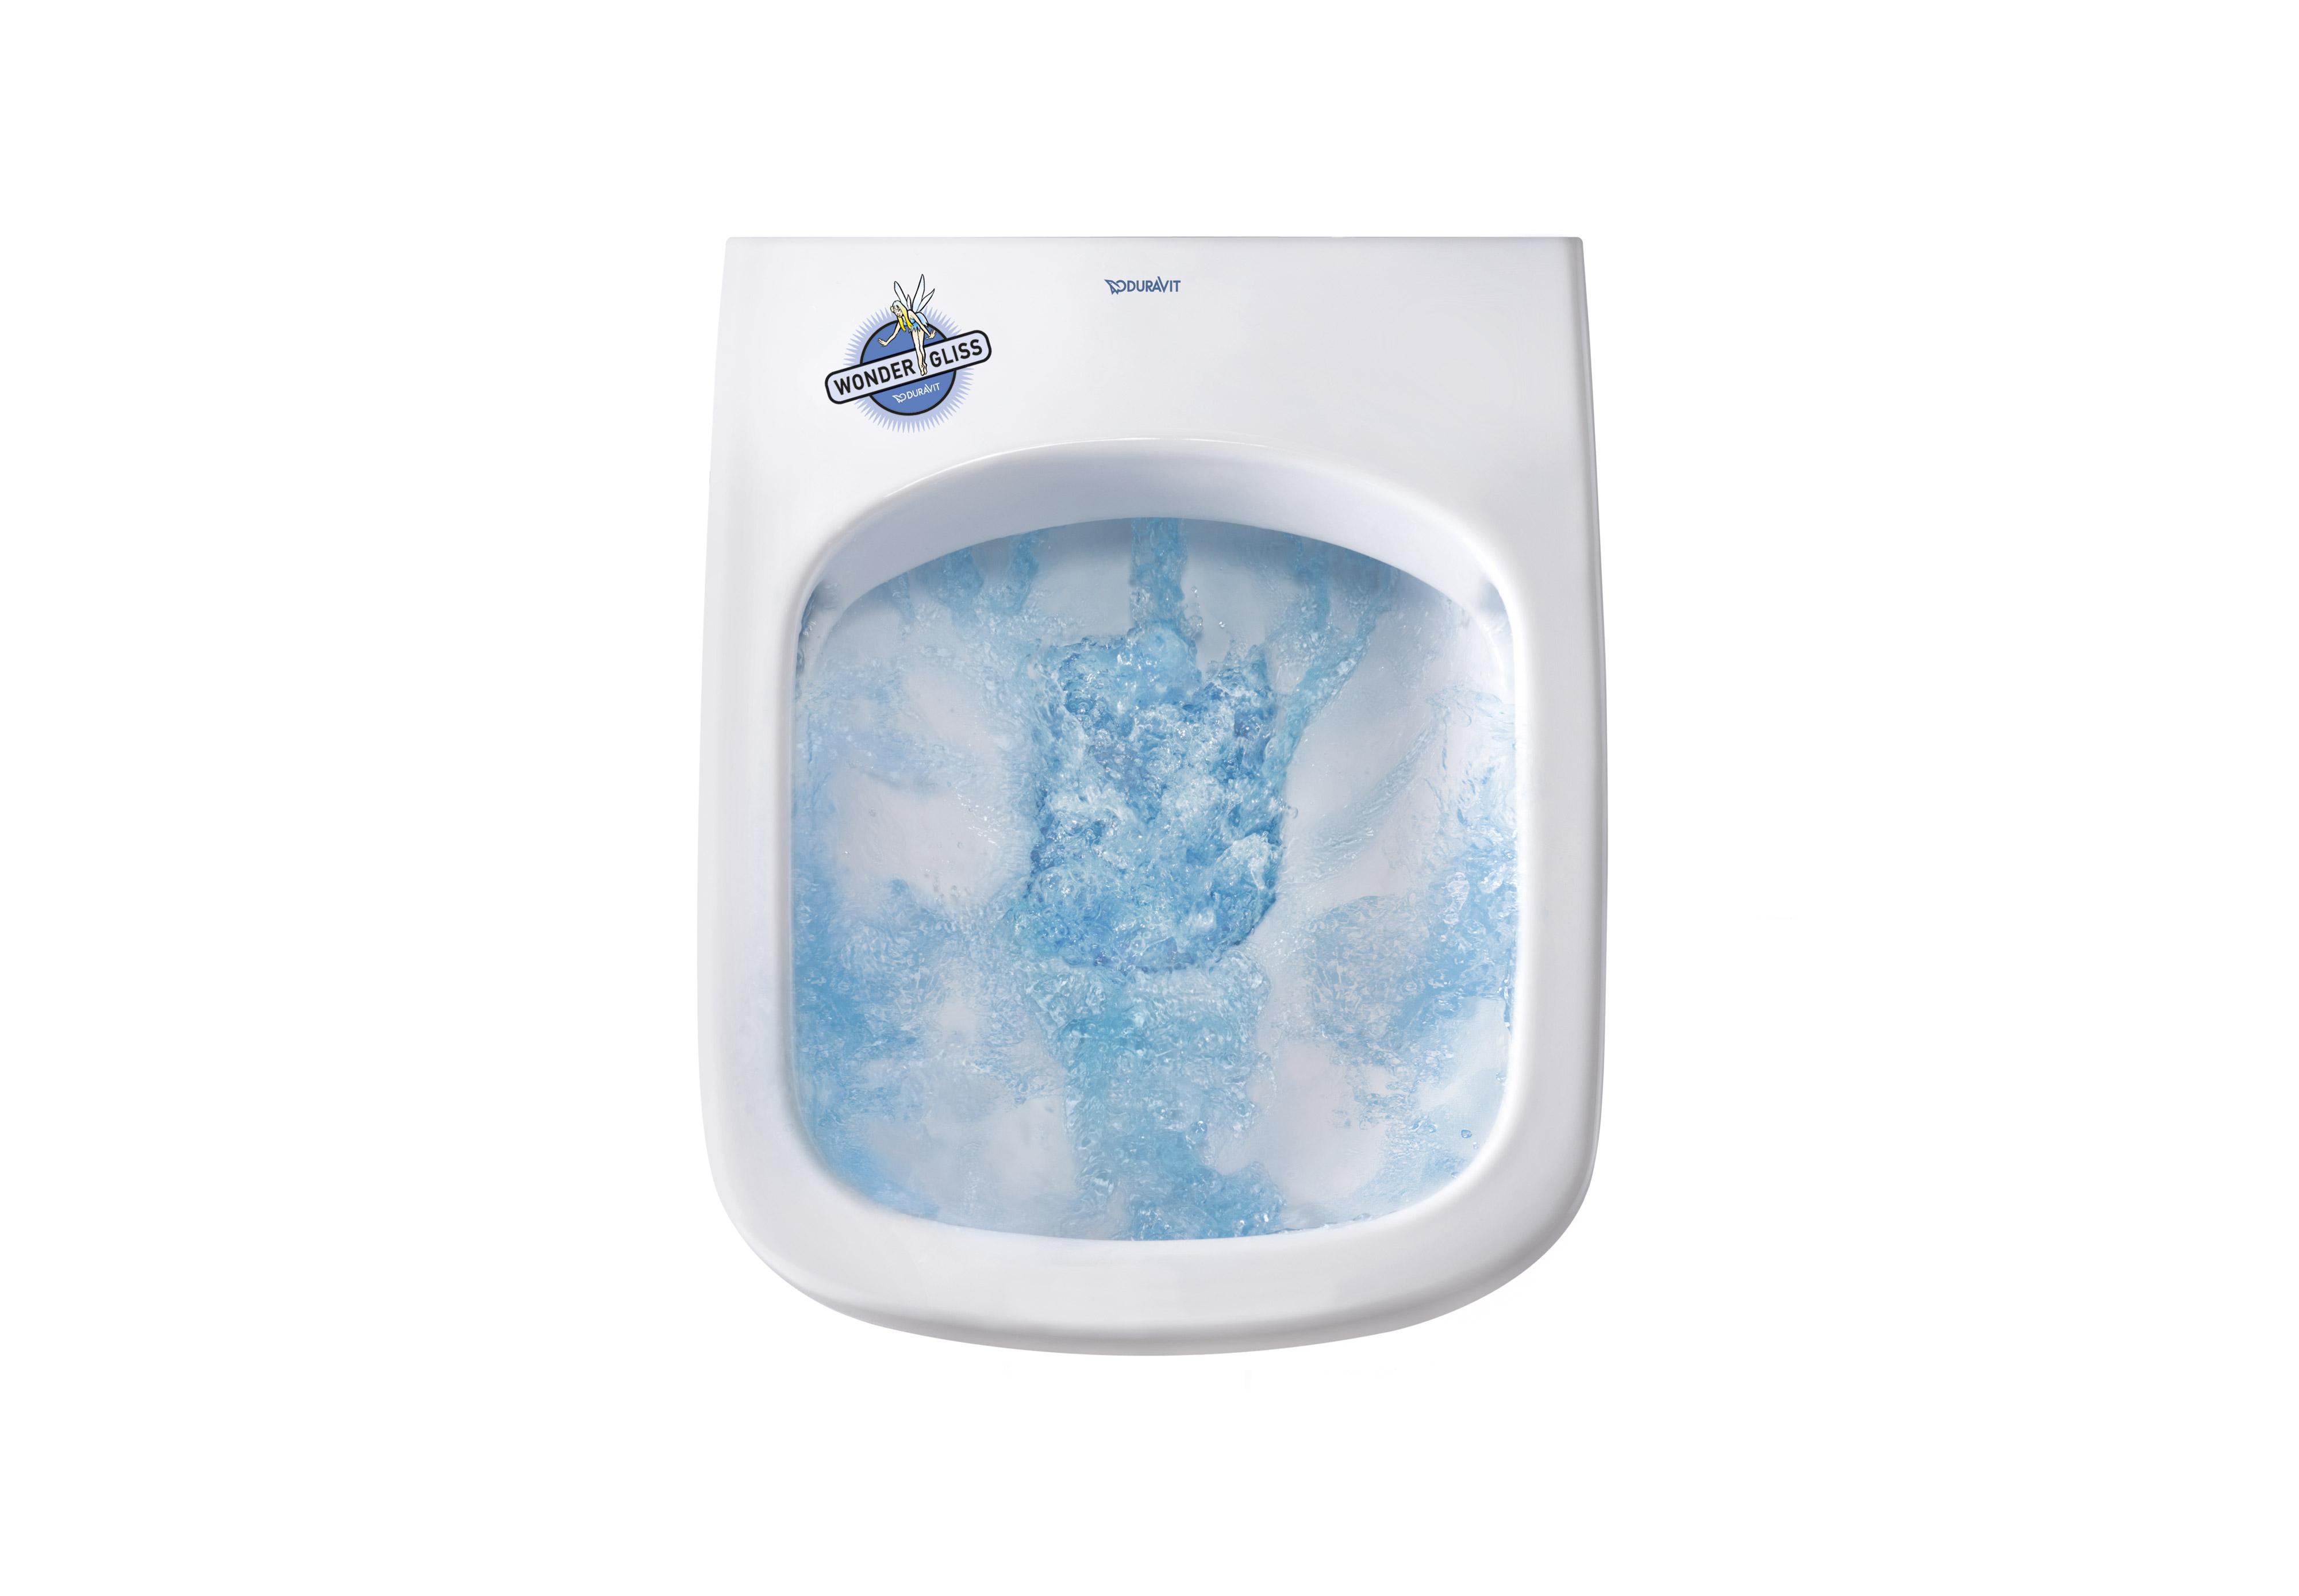 Duravit Starck 3 Toilets Washhbasins Amp More Duravit